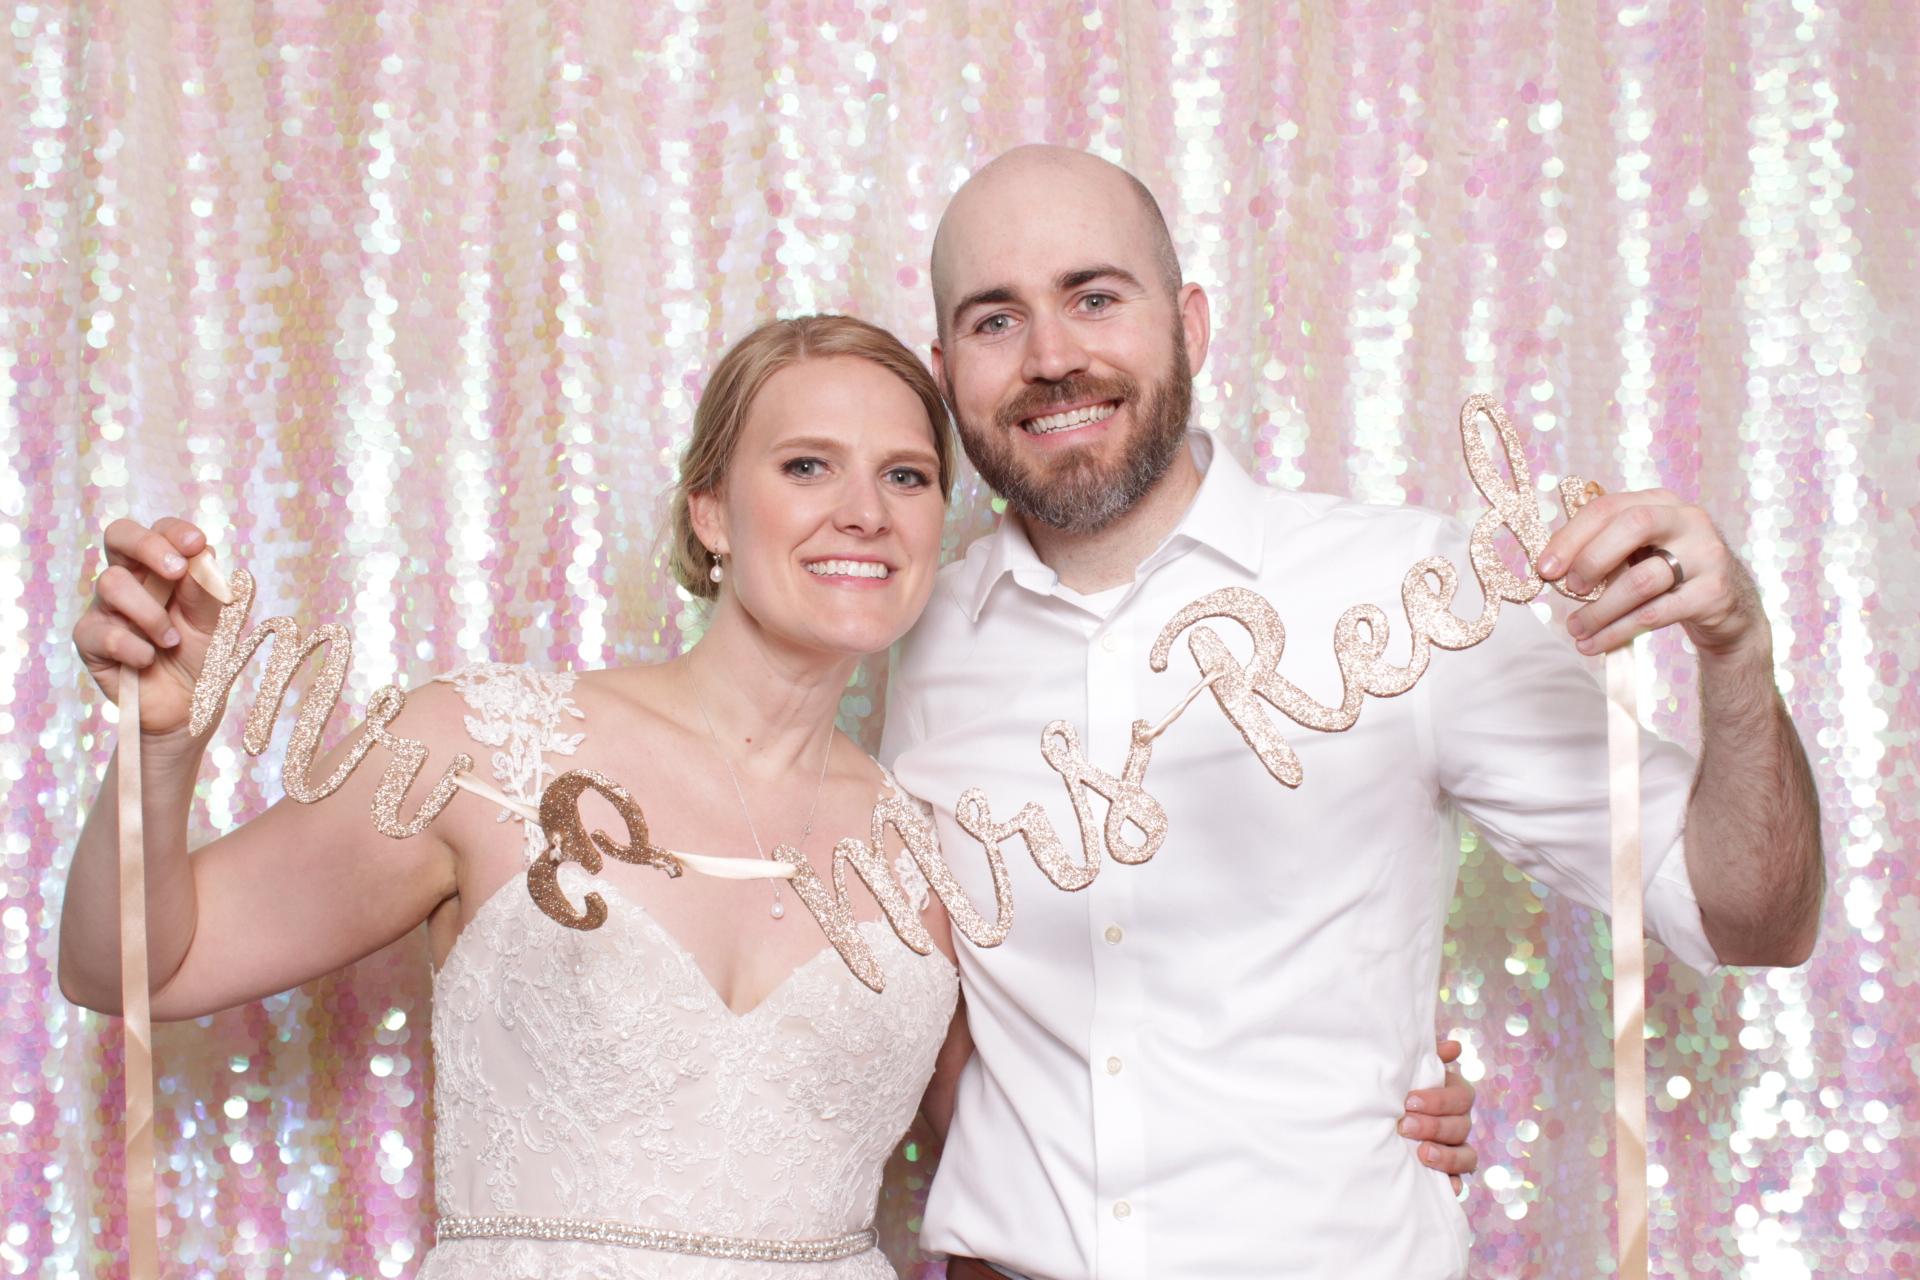 KELLY + ALEX WEDDING | HOT PINK PHOTO BOOTH